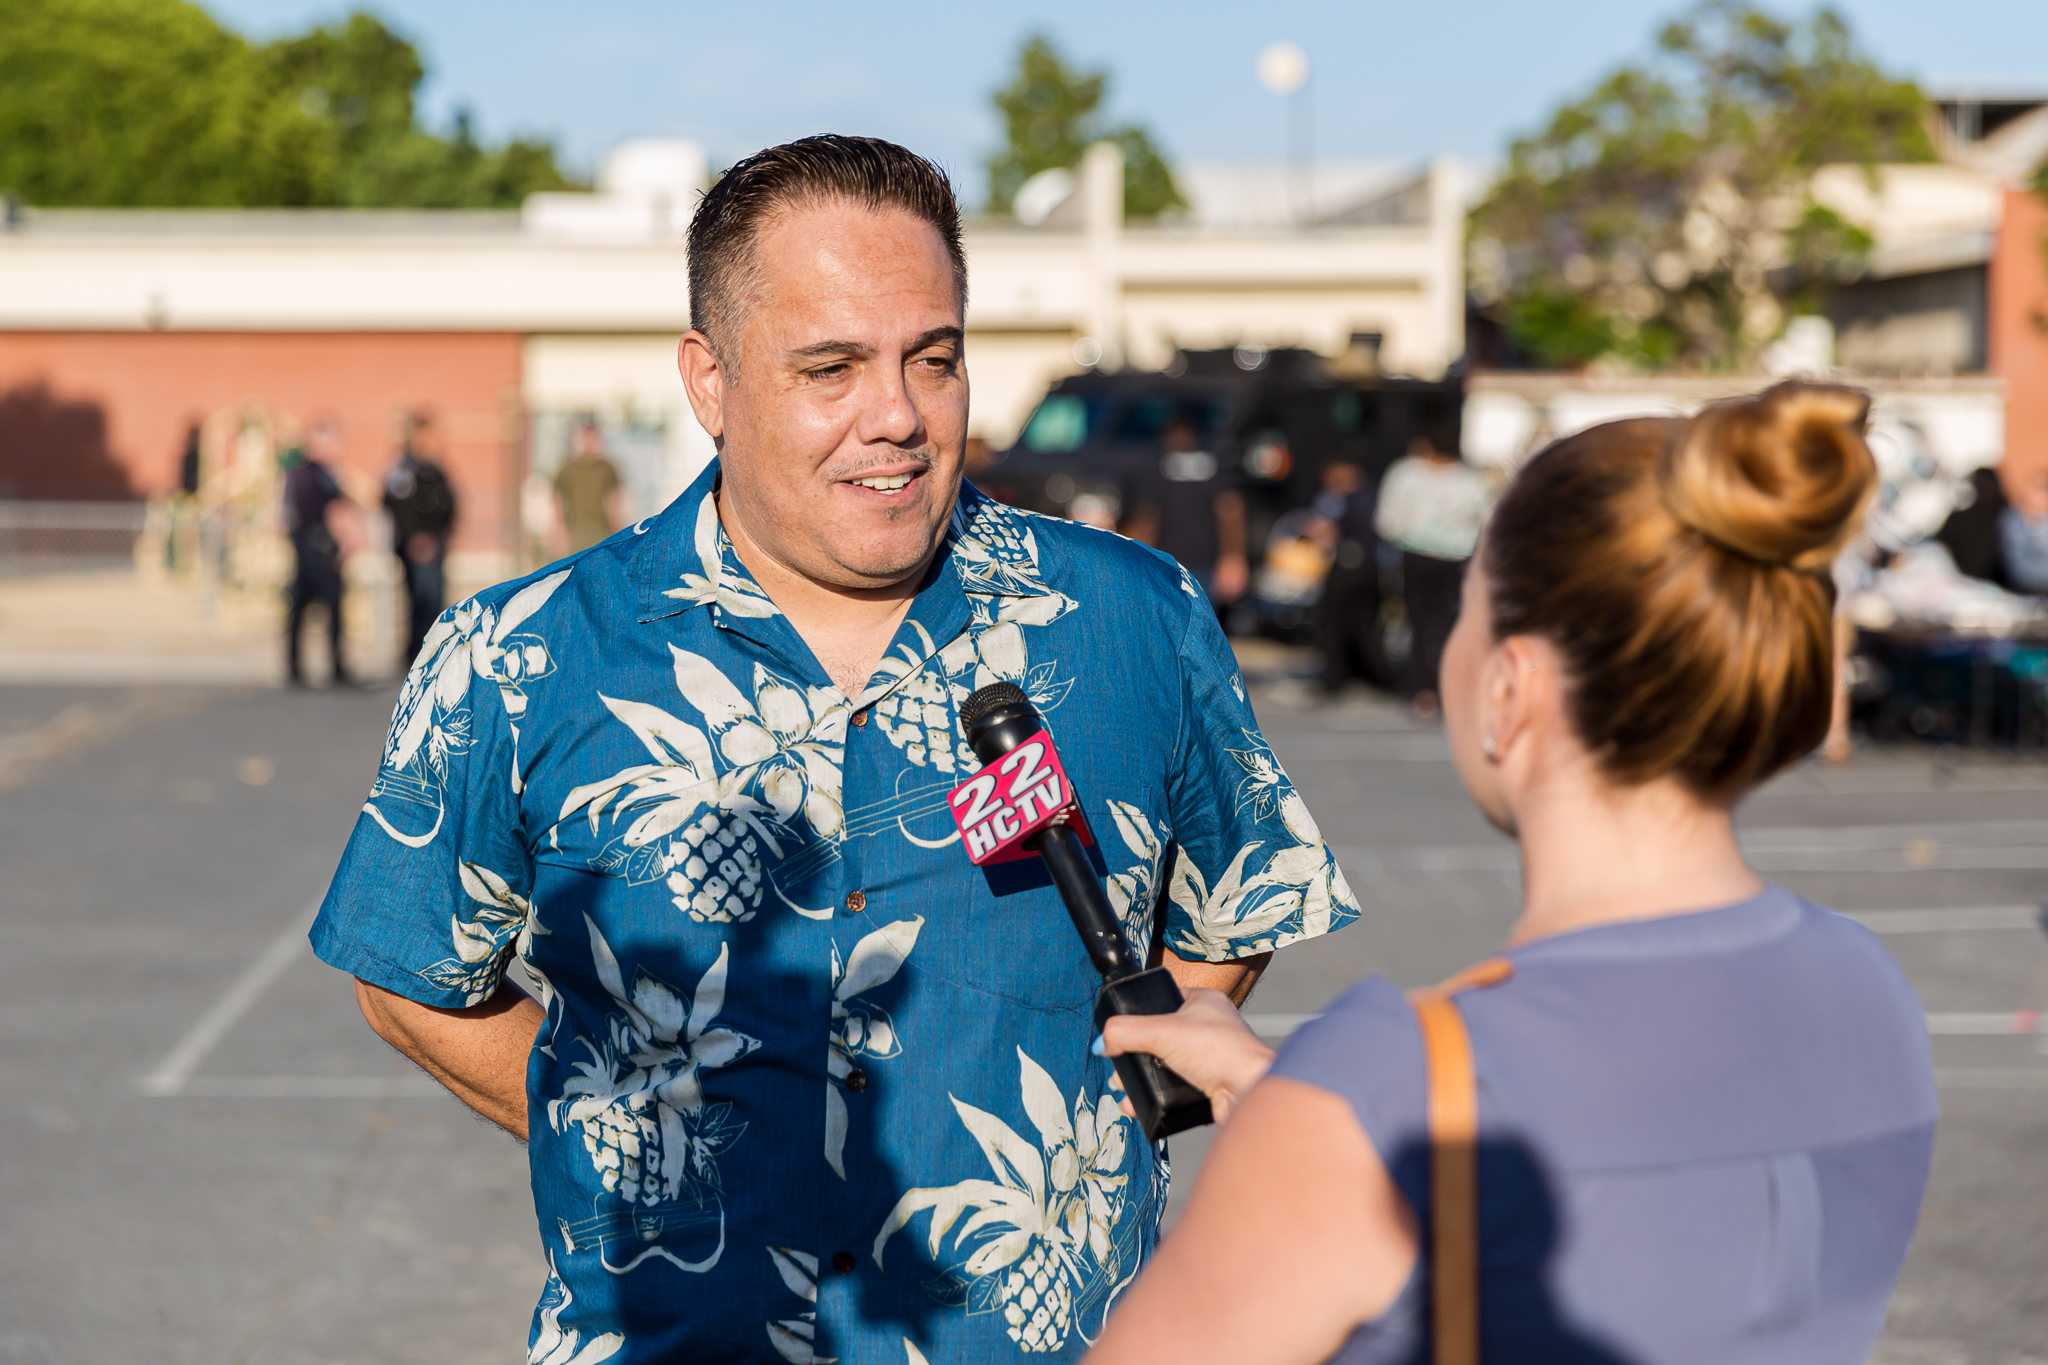 Interview with Mayor Alex Vargas